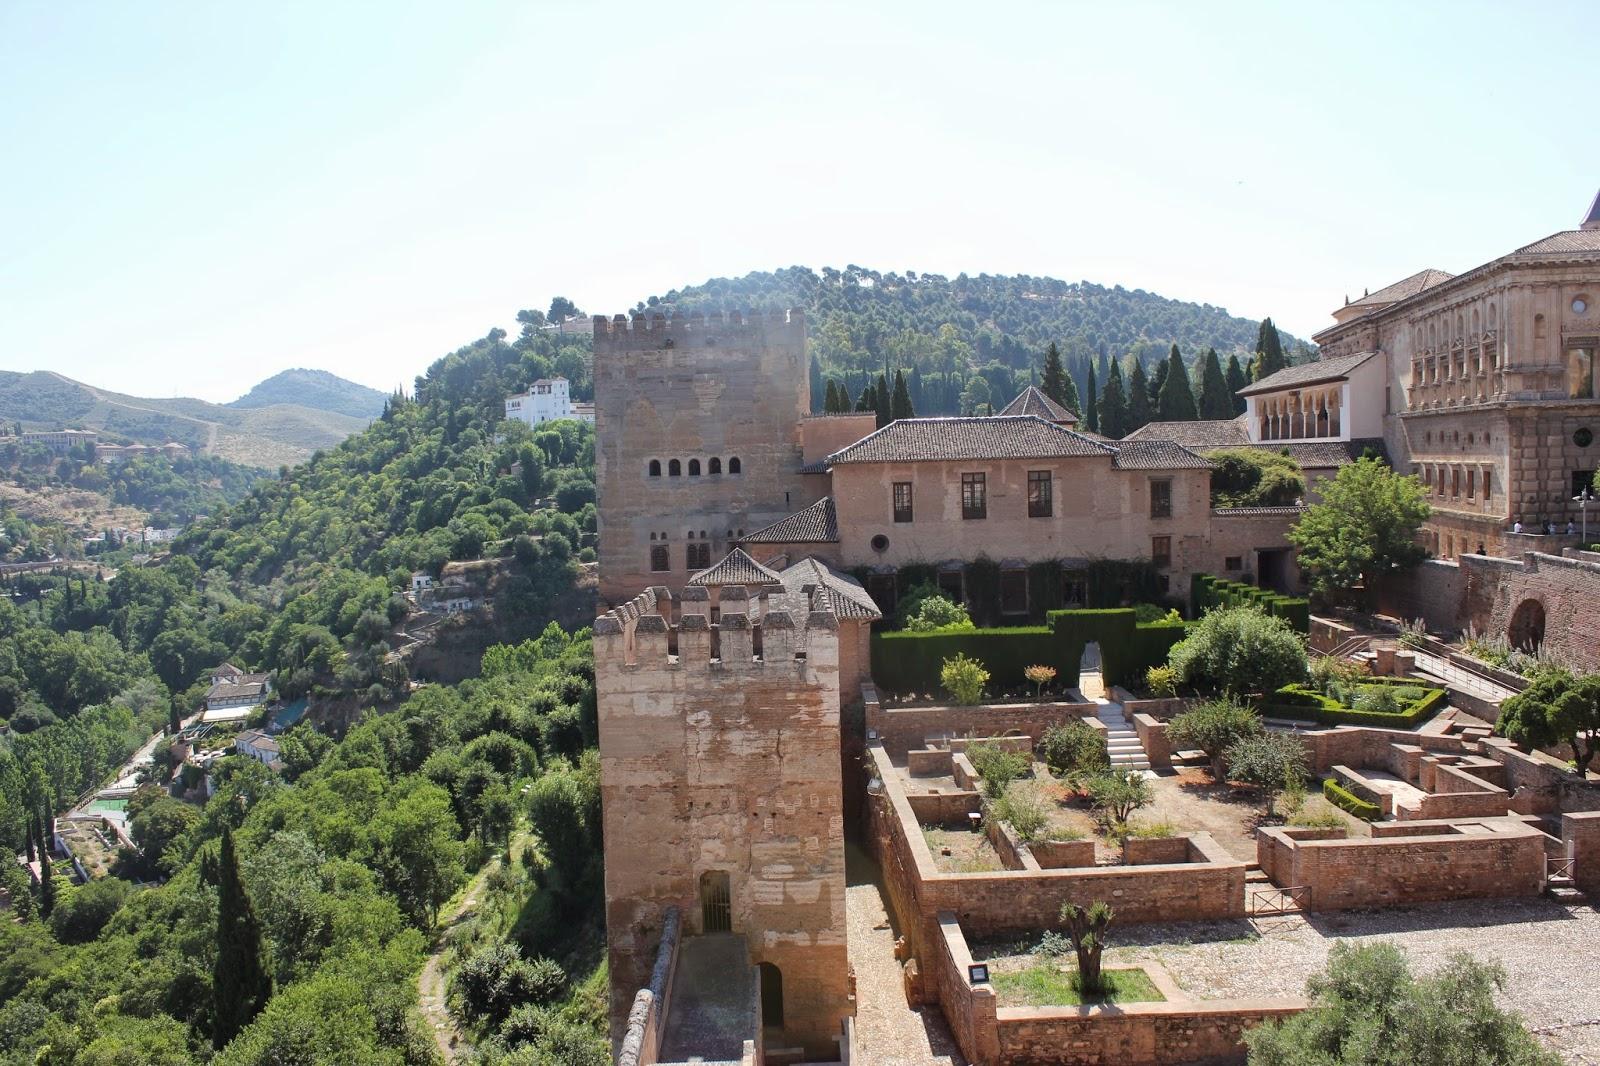 Maravillas ocultas de espa a granada la alhambra i el for Jardin de la reina granada